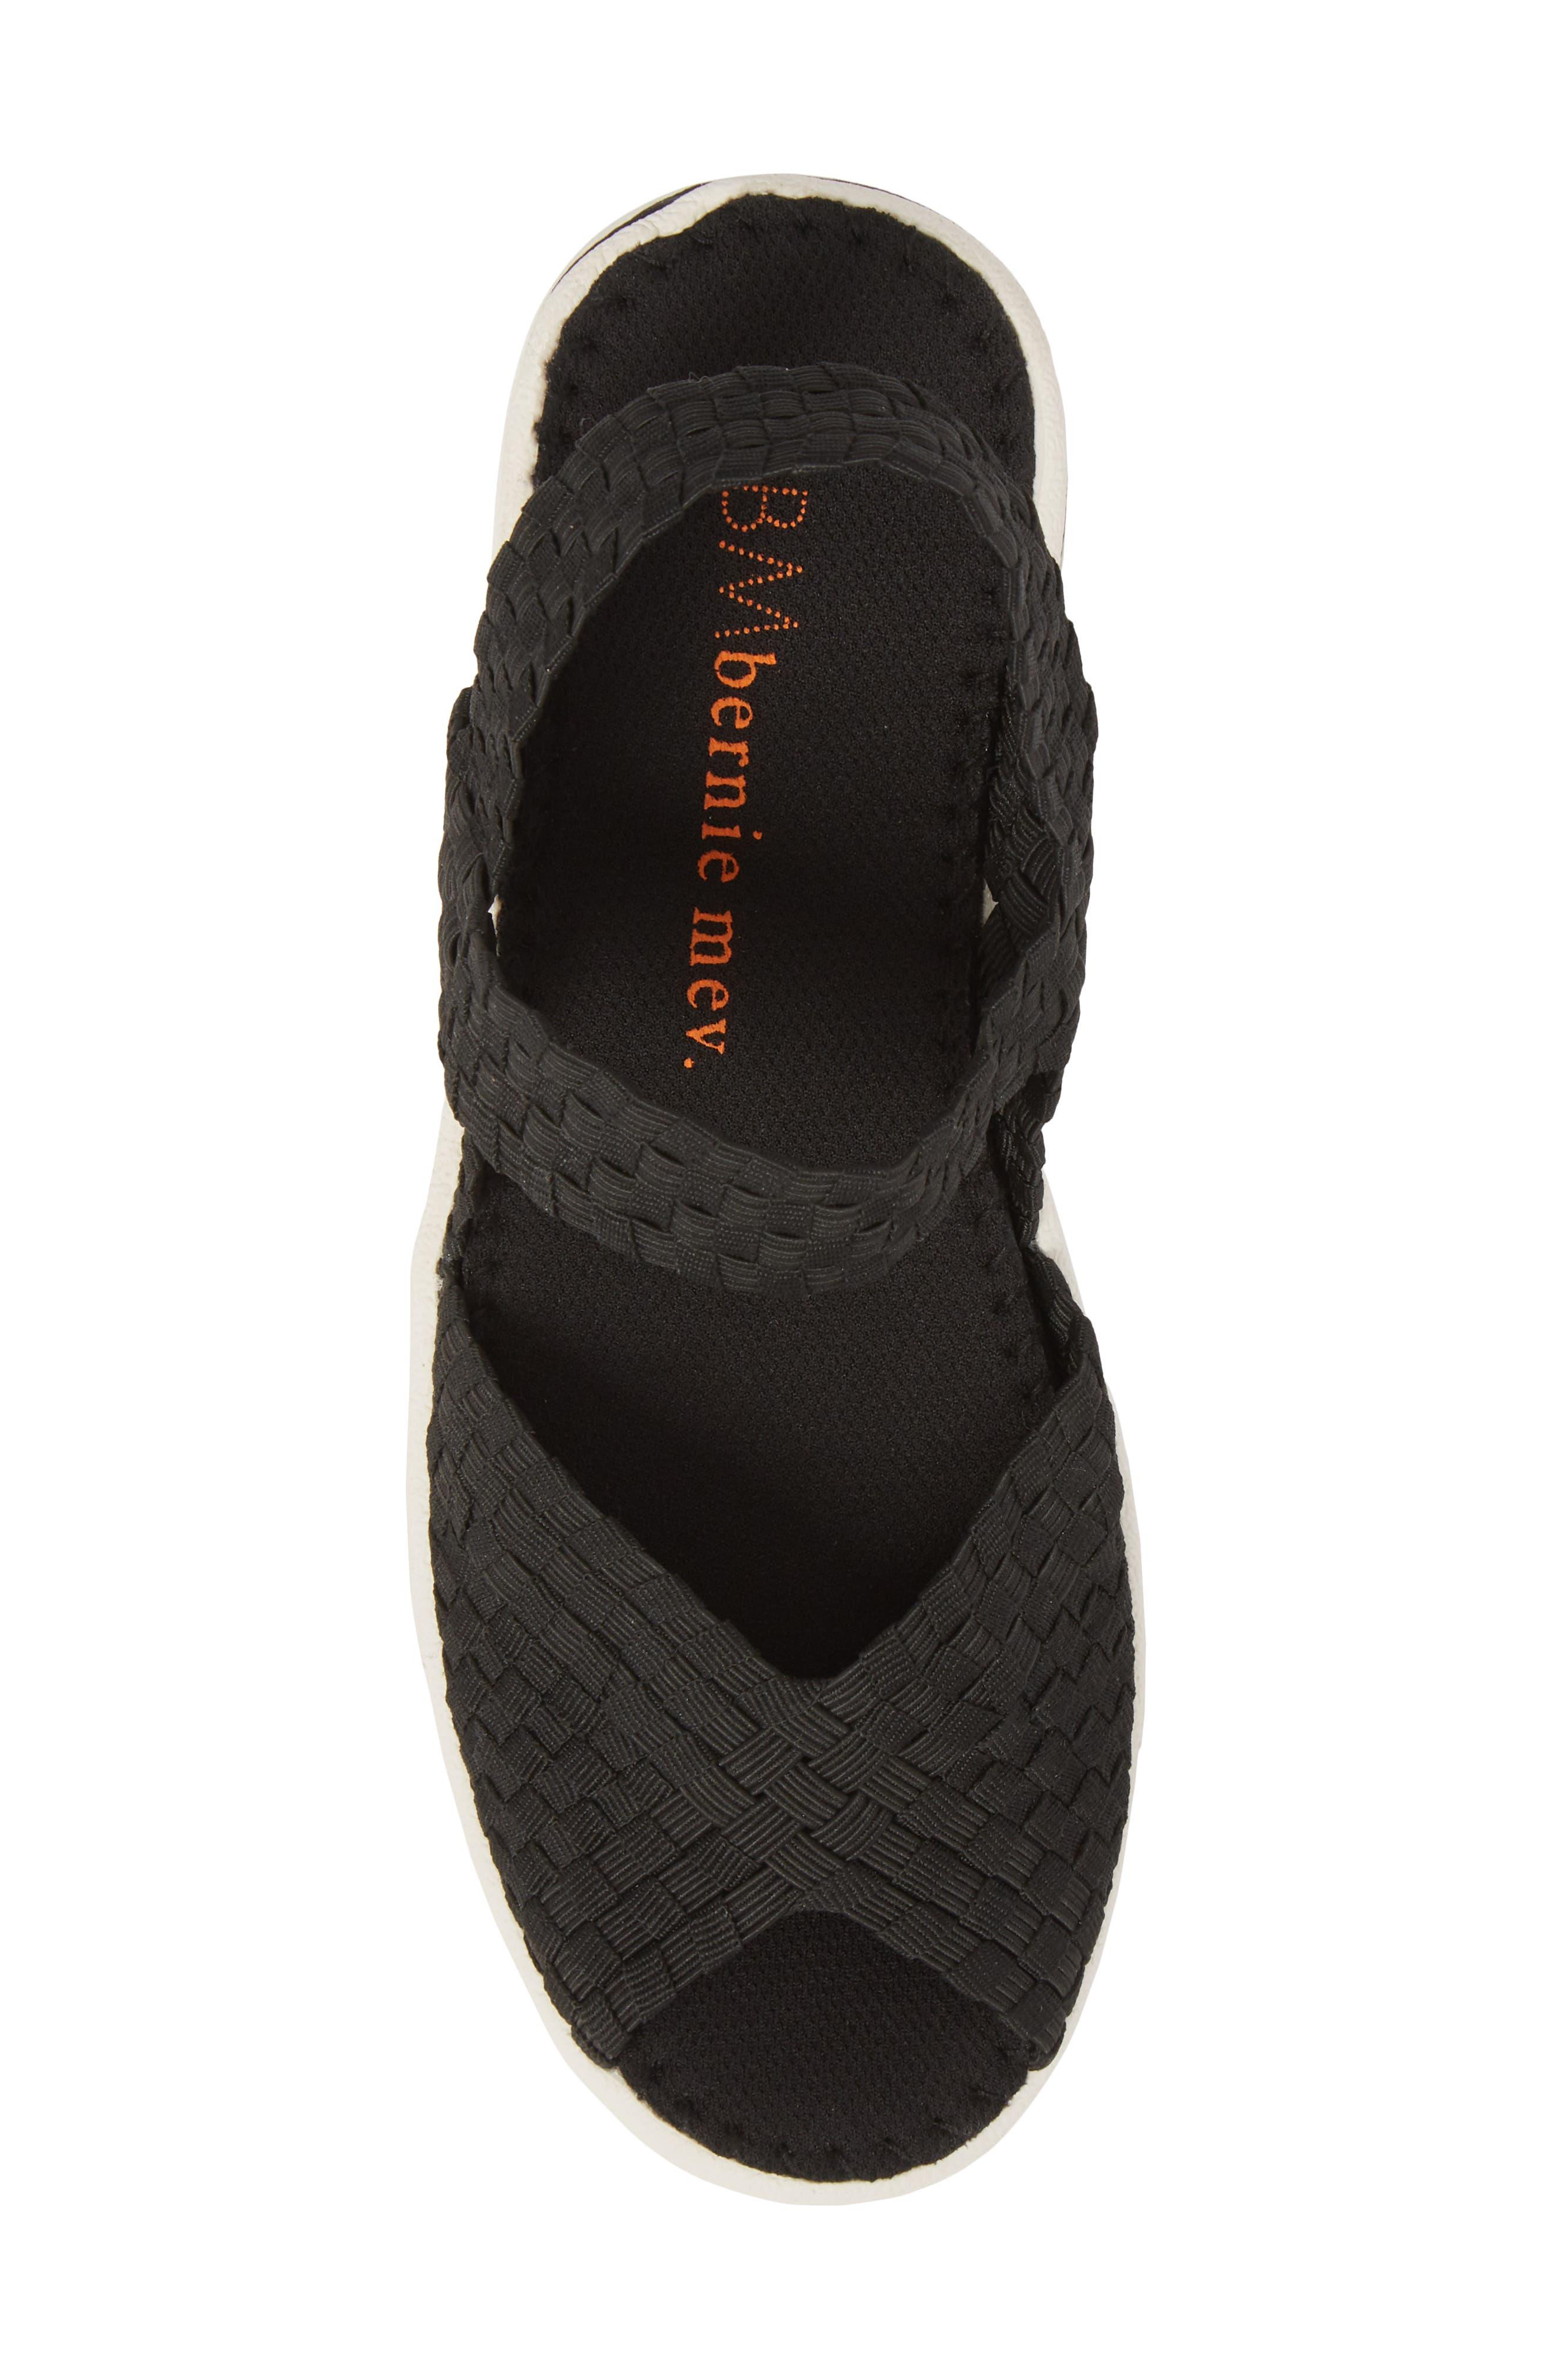 Lux Garden Sandal,                             Alternate thumbnail 5, color,                             BLACK FABRIC